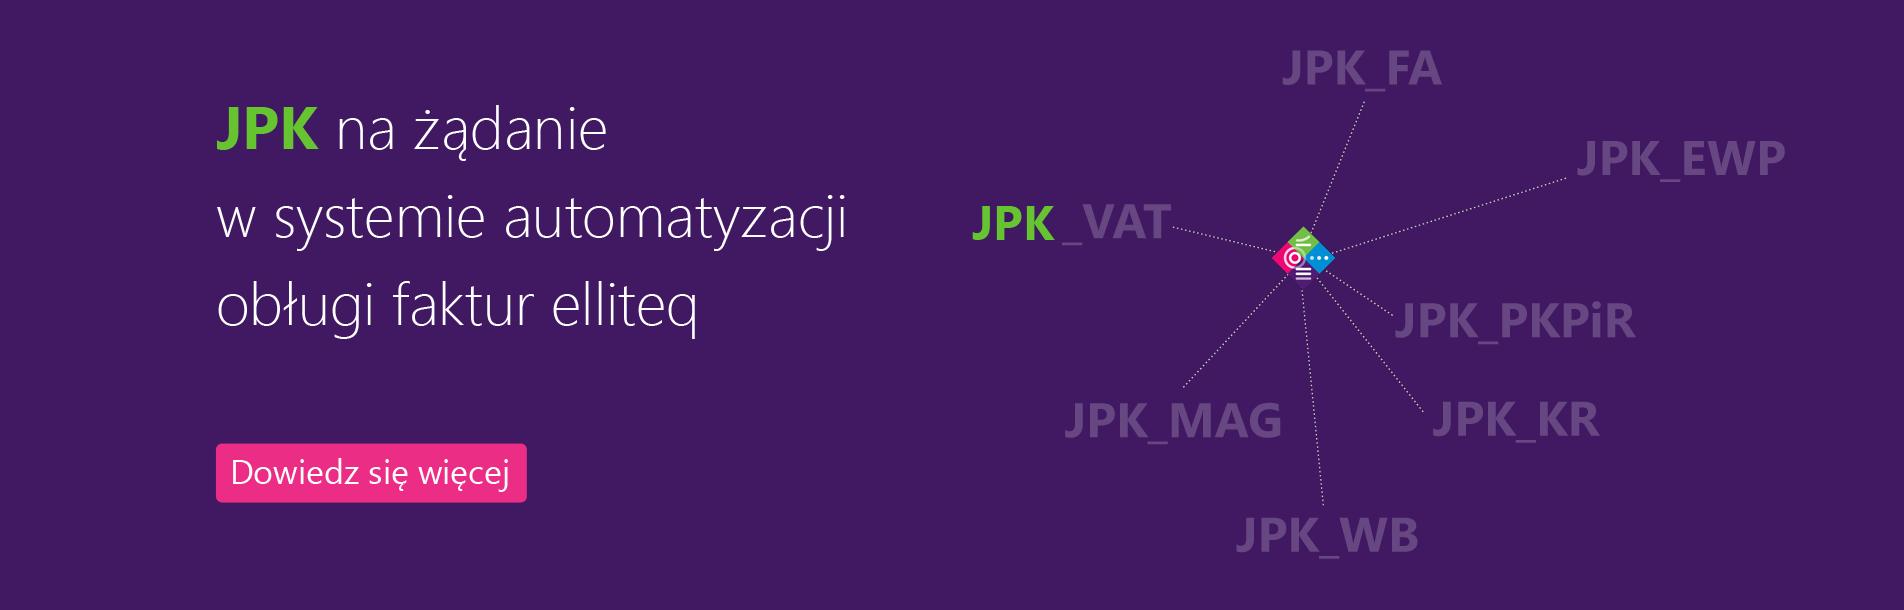 jpk-na-zadanie-slide